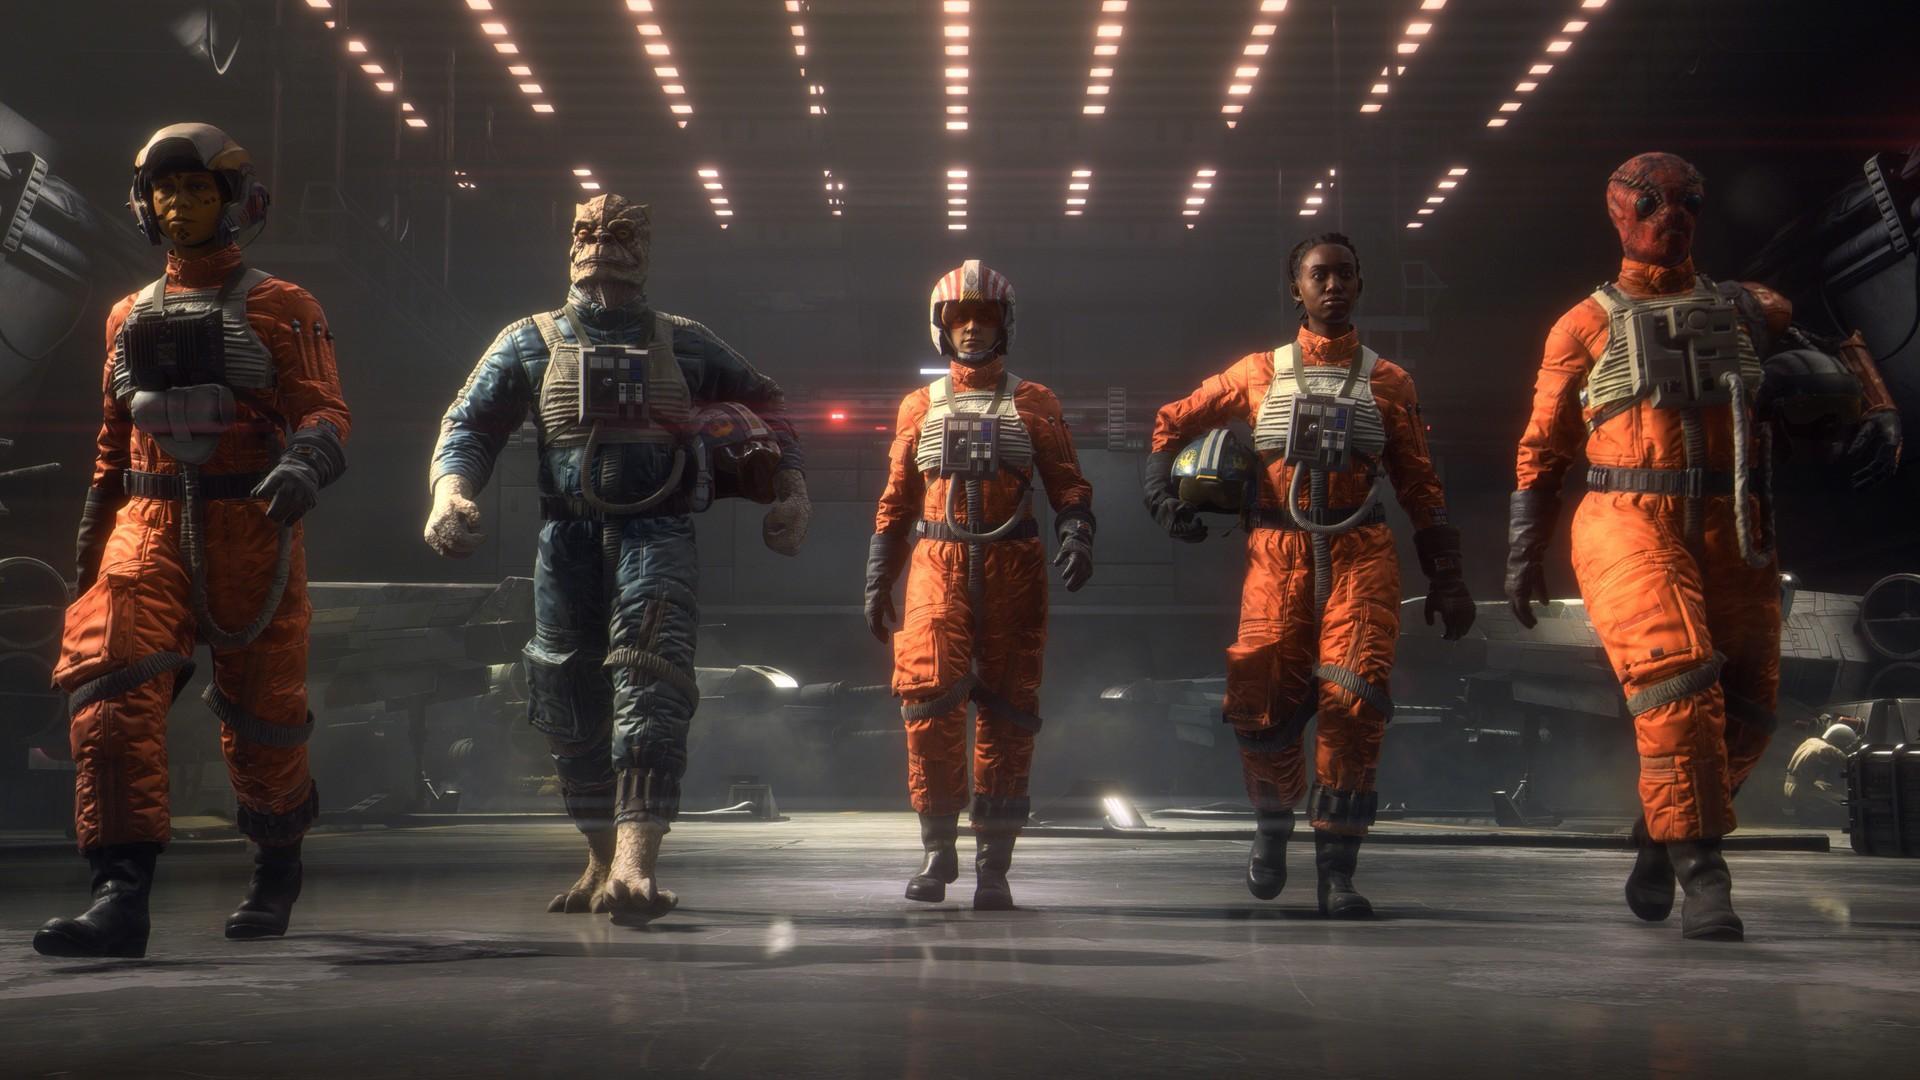 Слух: В июне подписчики PS+ получат Virtua Fighter: Ultimate Showdown, Star Wars: Squadrons и Operation: Tango 2